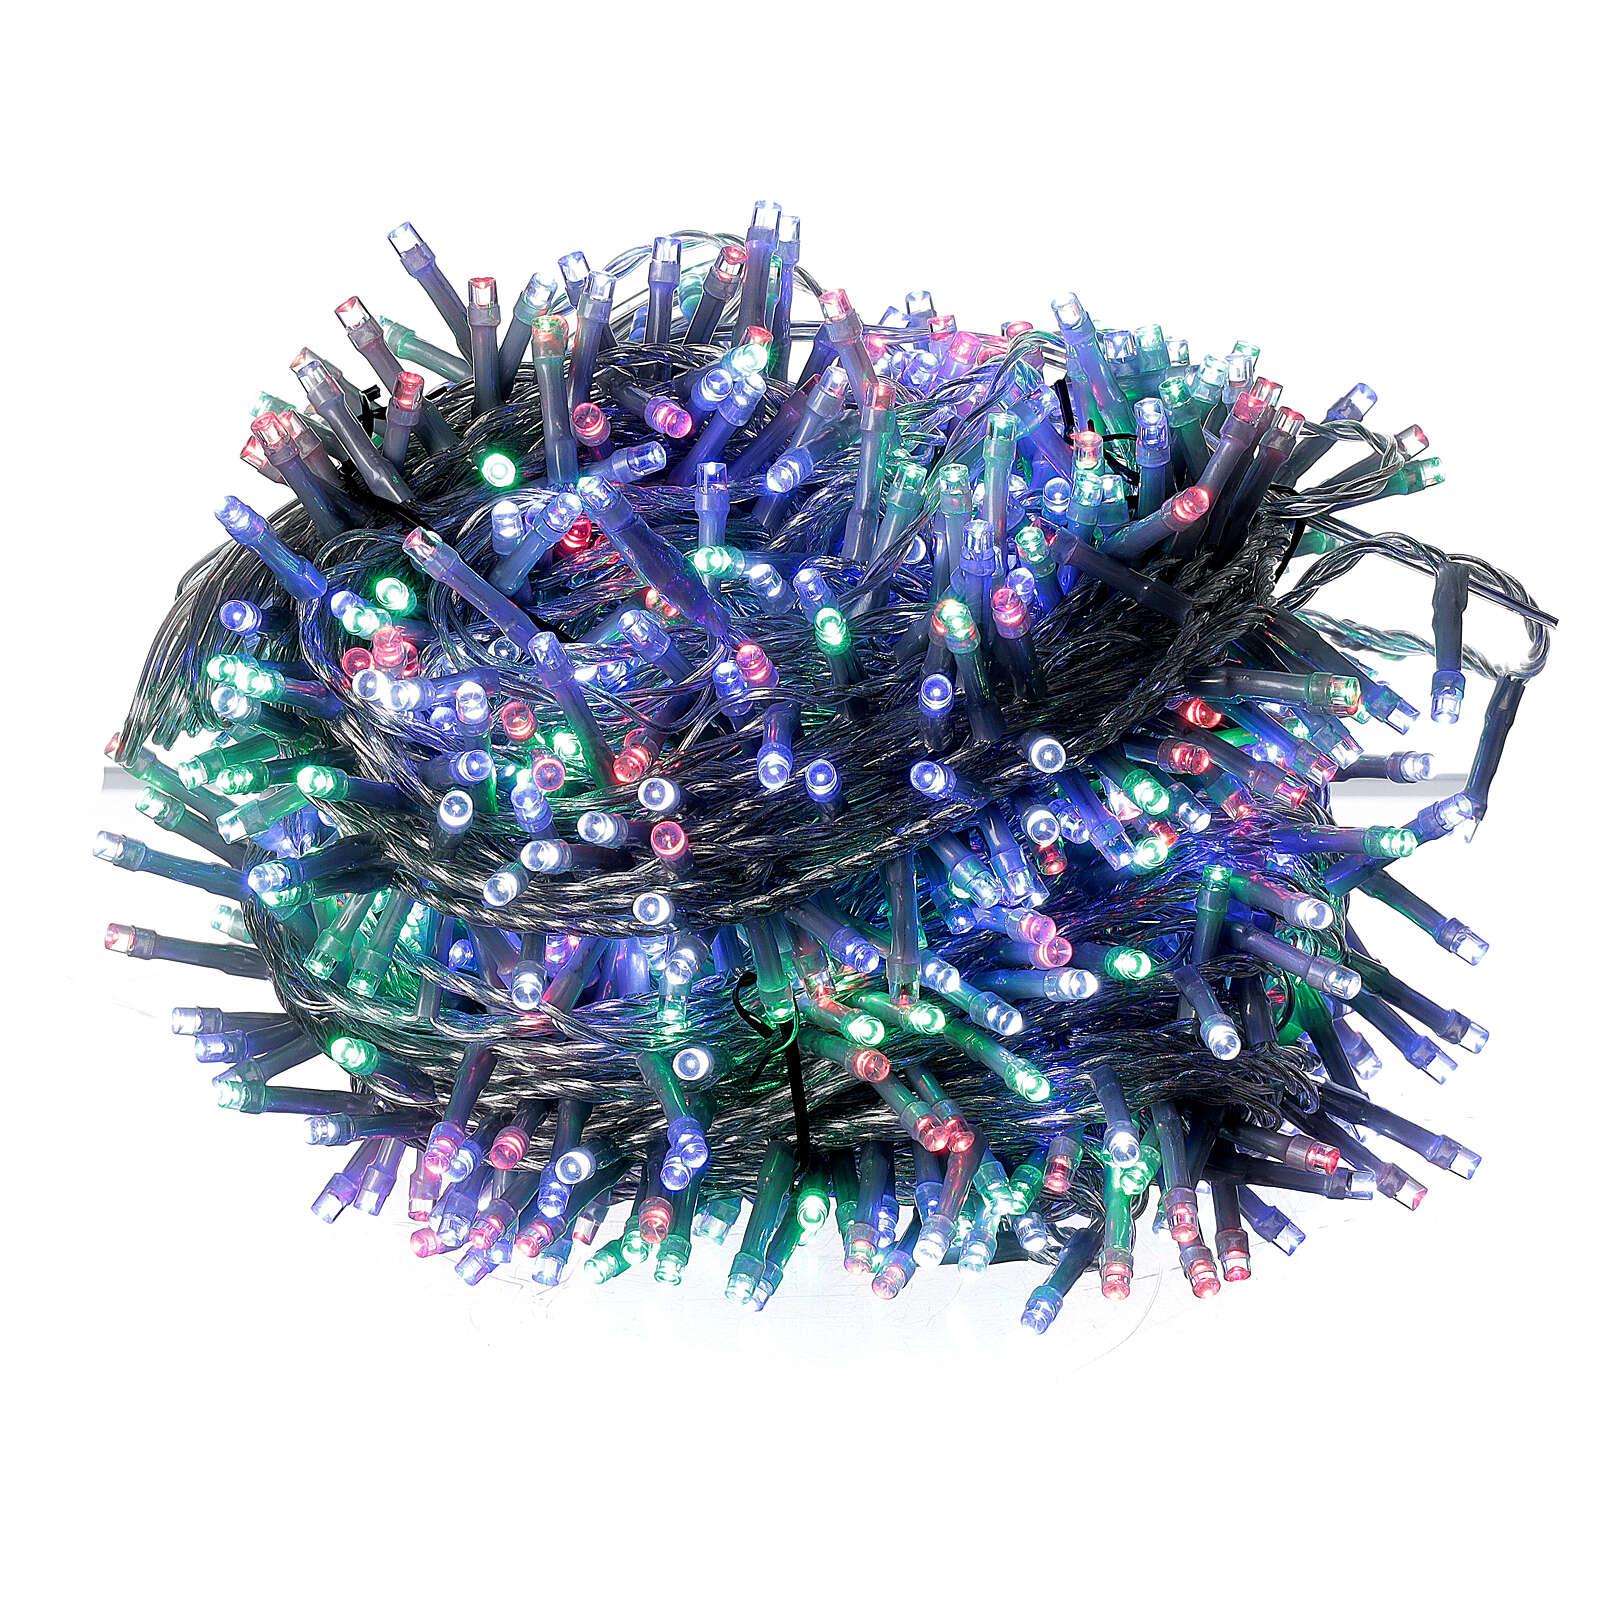 Luce Natale 750 led multicolor cavo trasparente int est 37,5 m 3